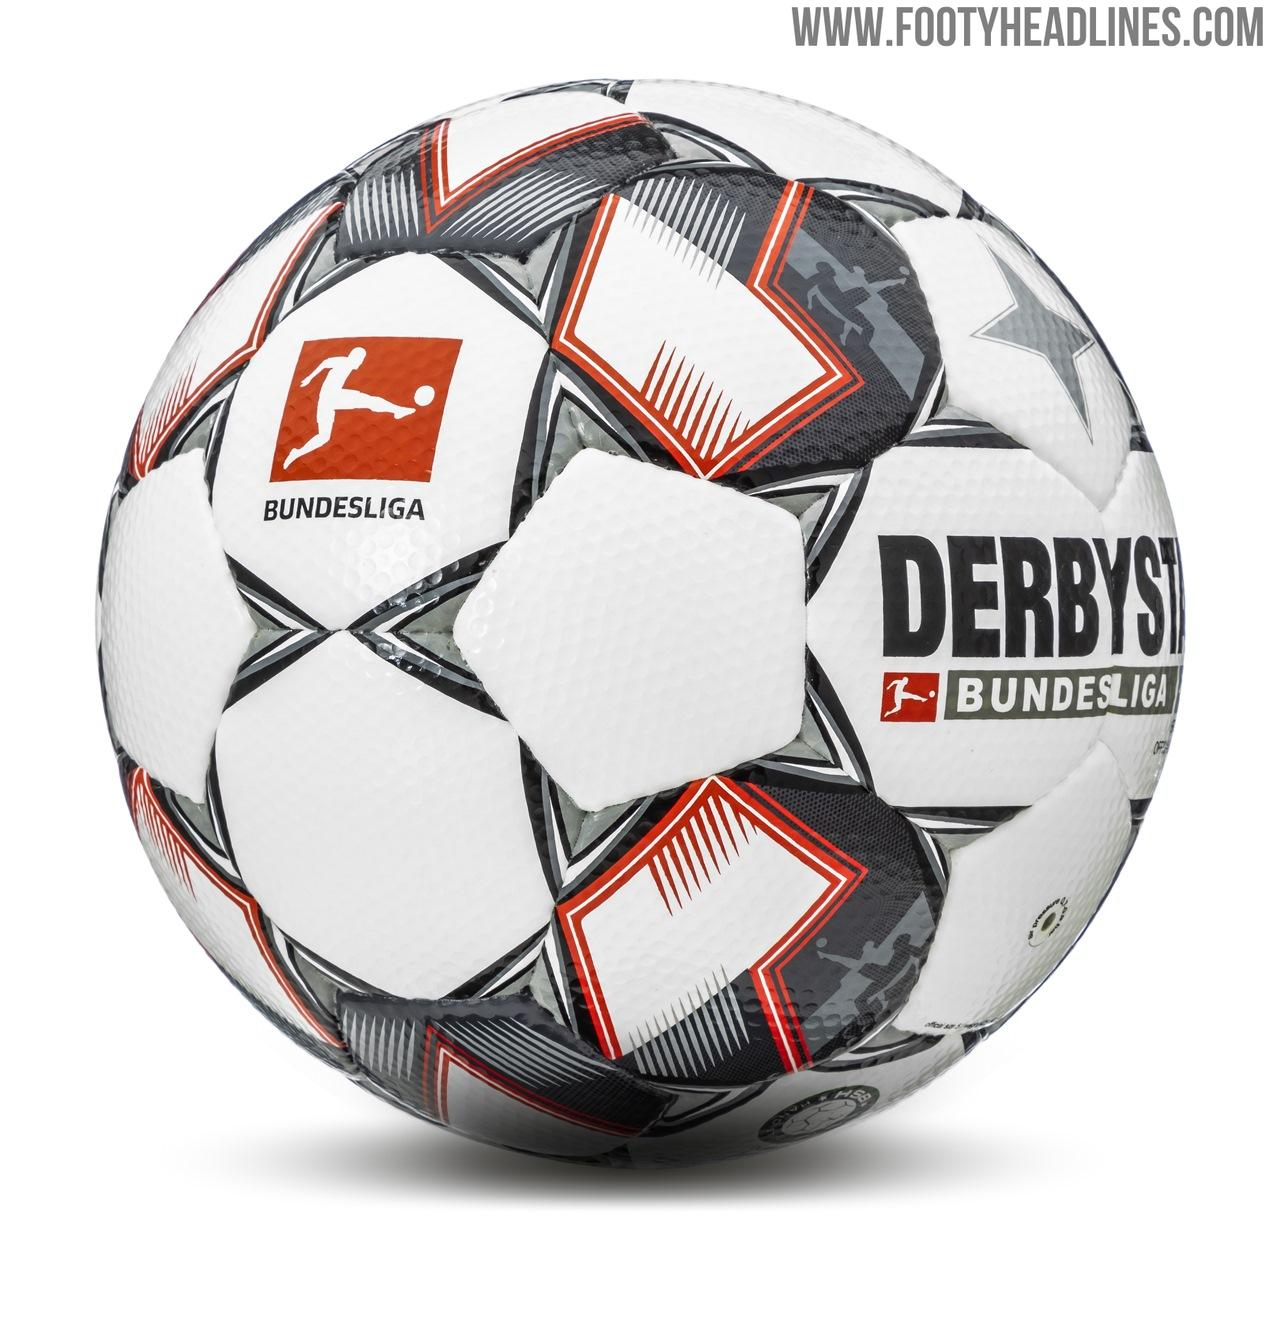 f587552ee3 Vale lembrar que Derbystar era a marca oficial das bolas da Bundesliga na  temporada 1979 1980